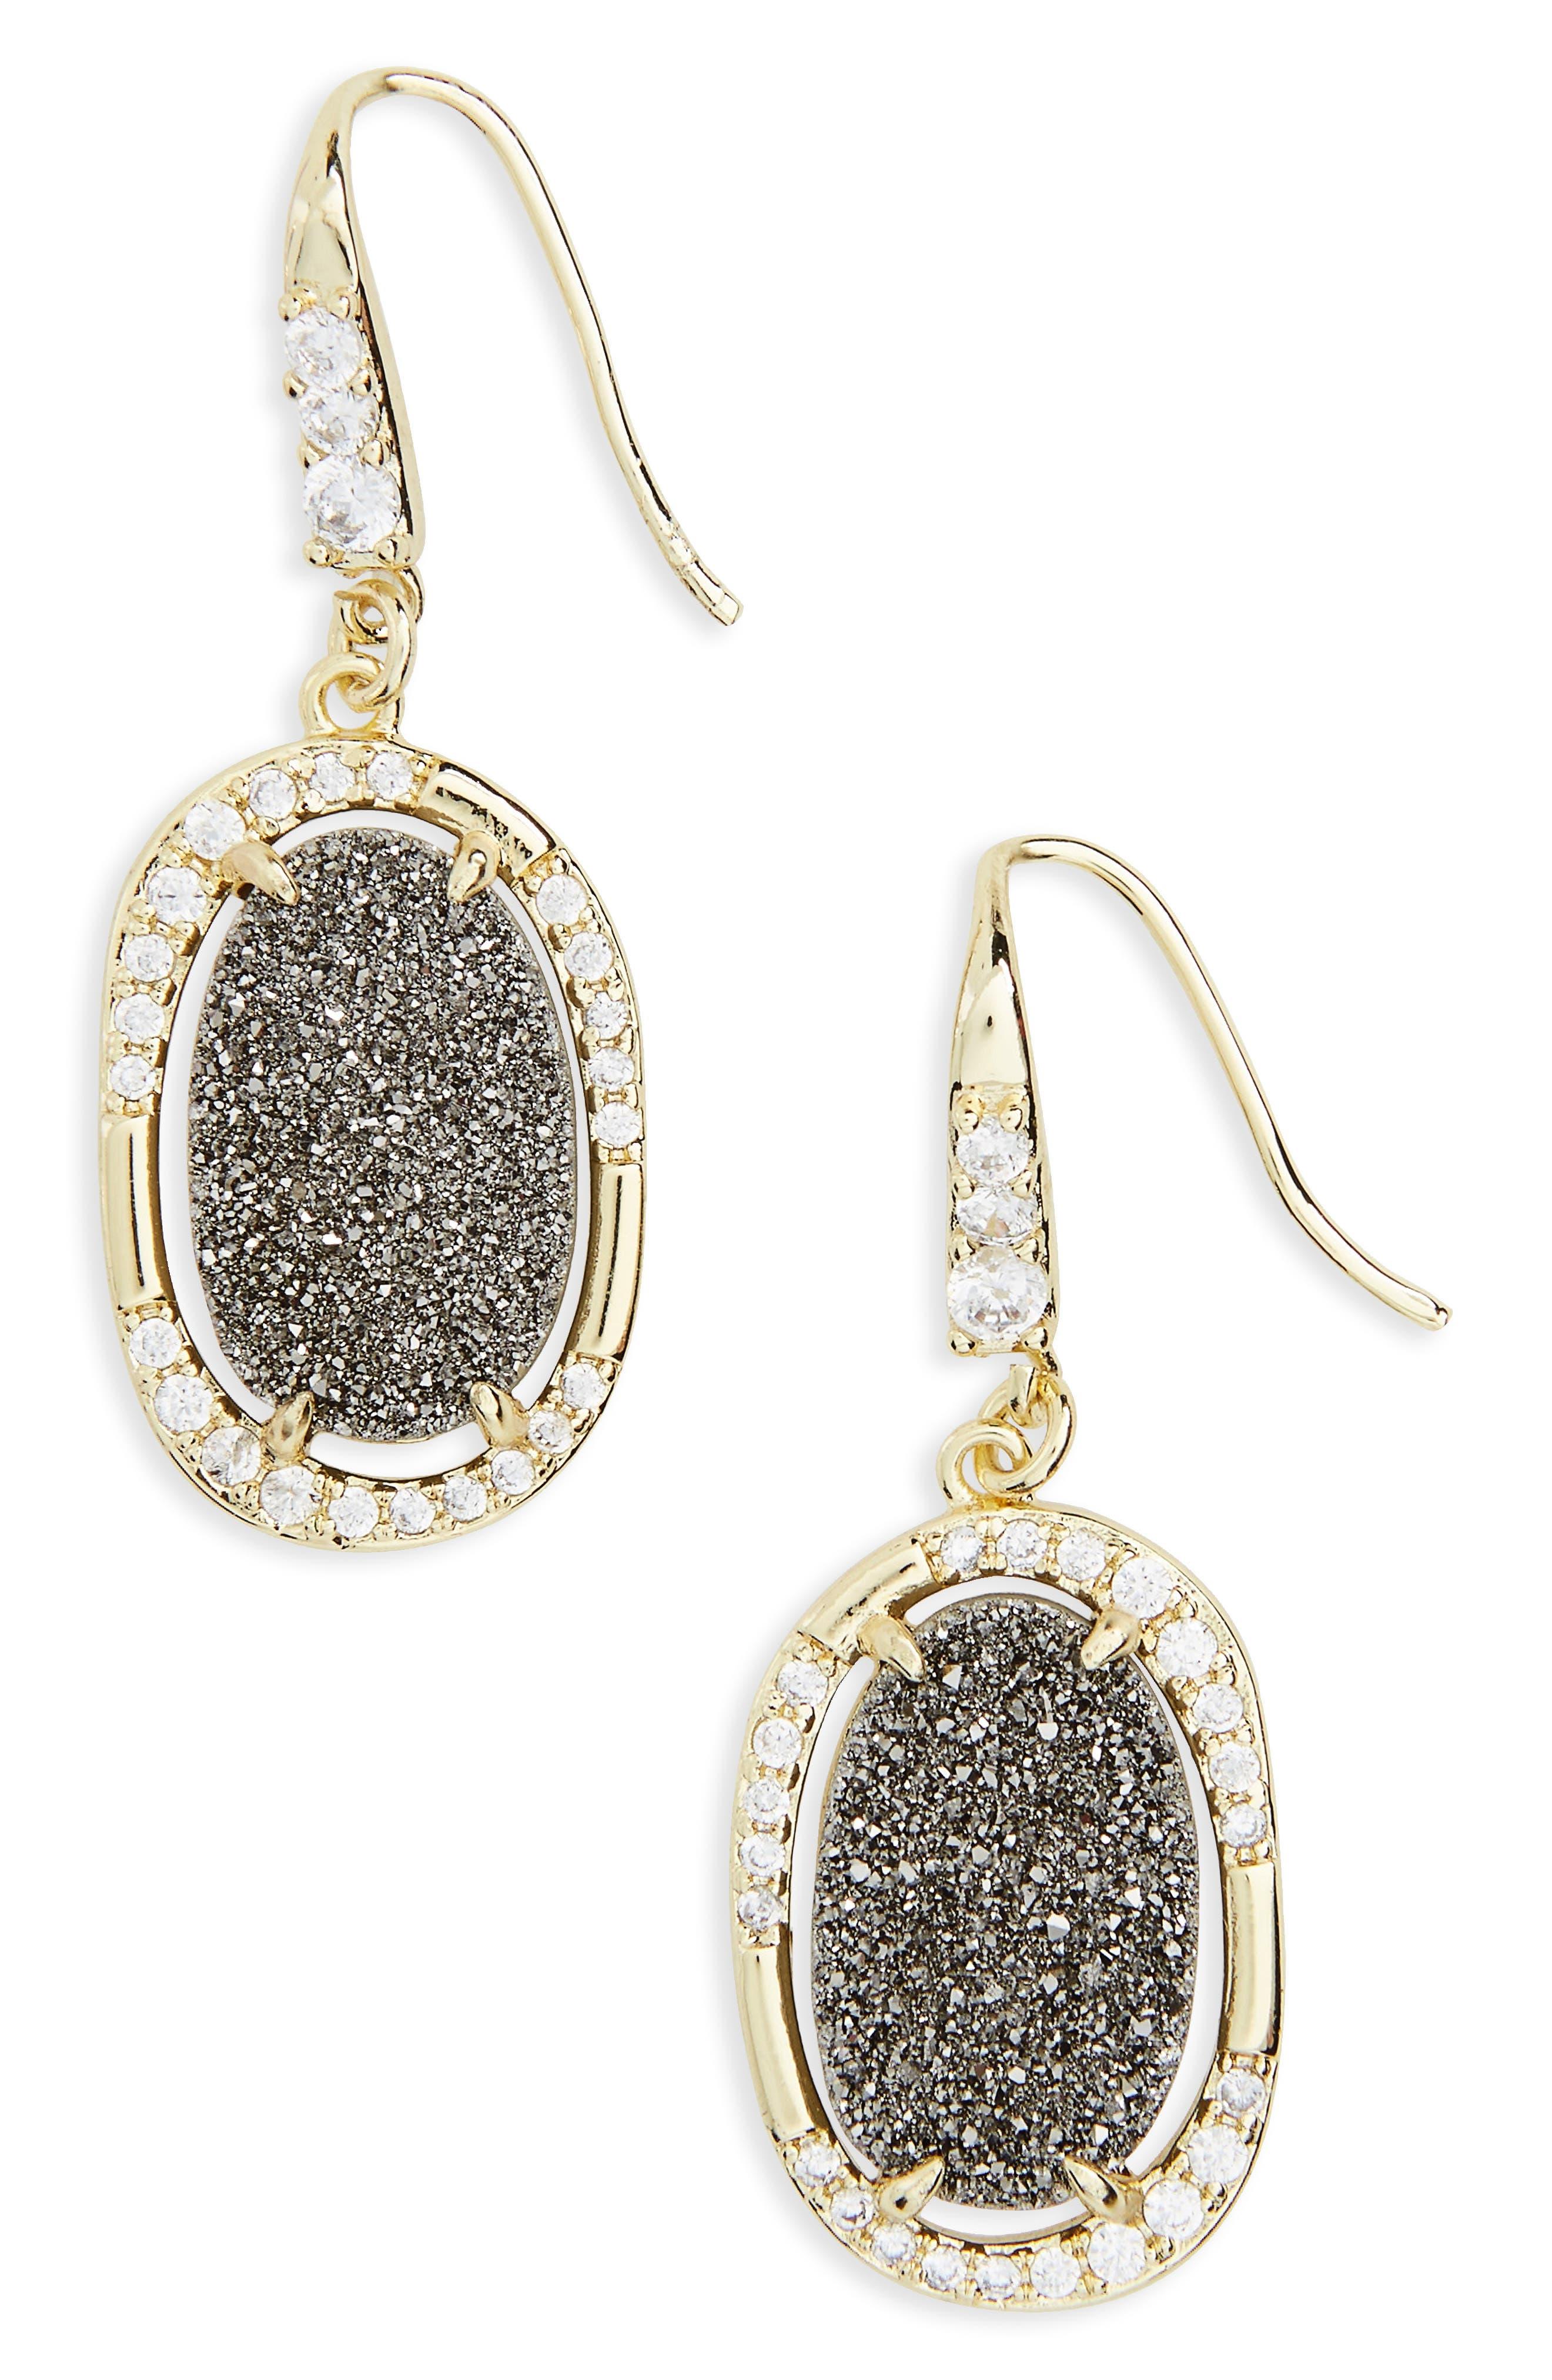 Kathy Drop Earrings,                         Main,                         color, Grey Druzy/ Gold